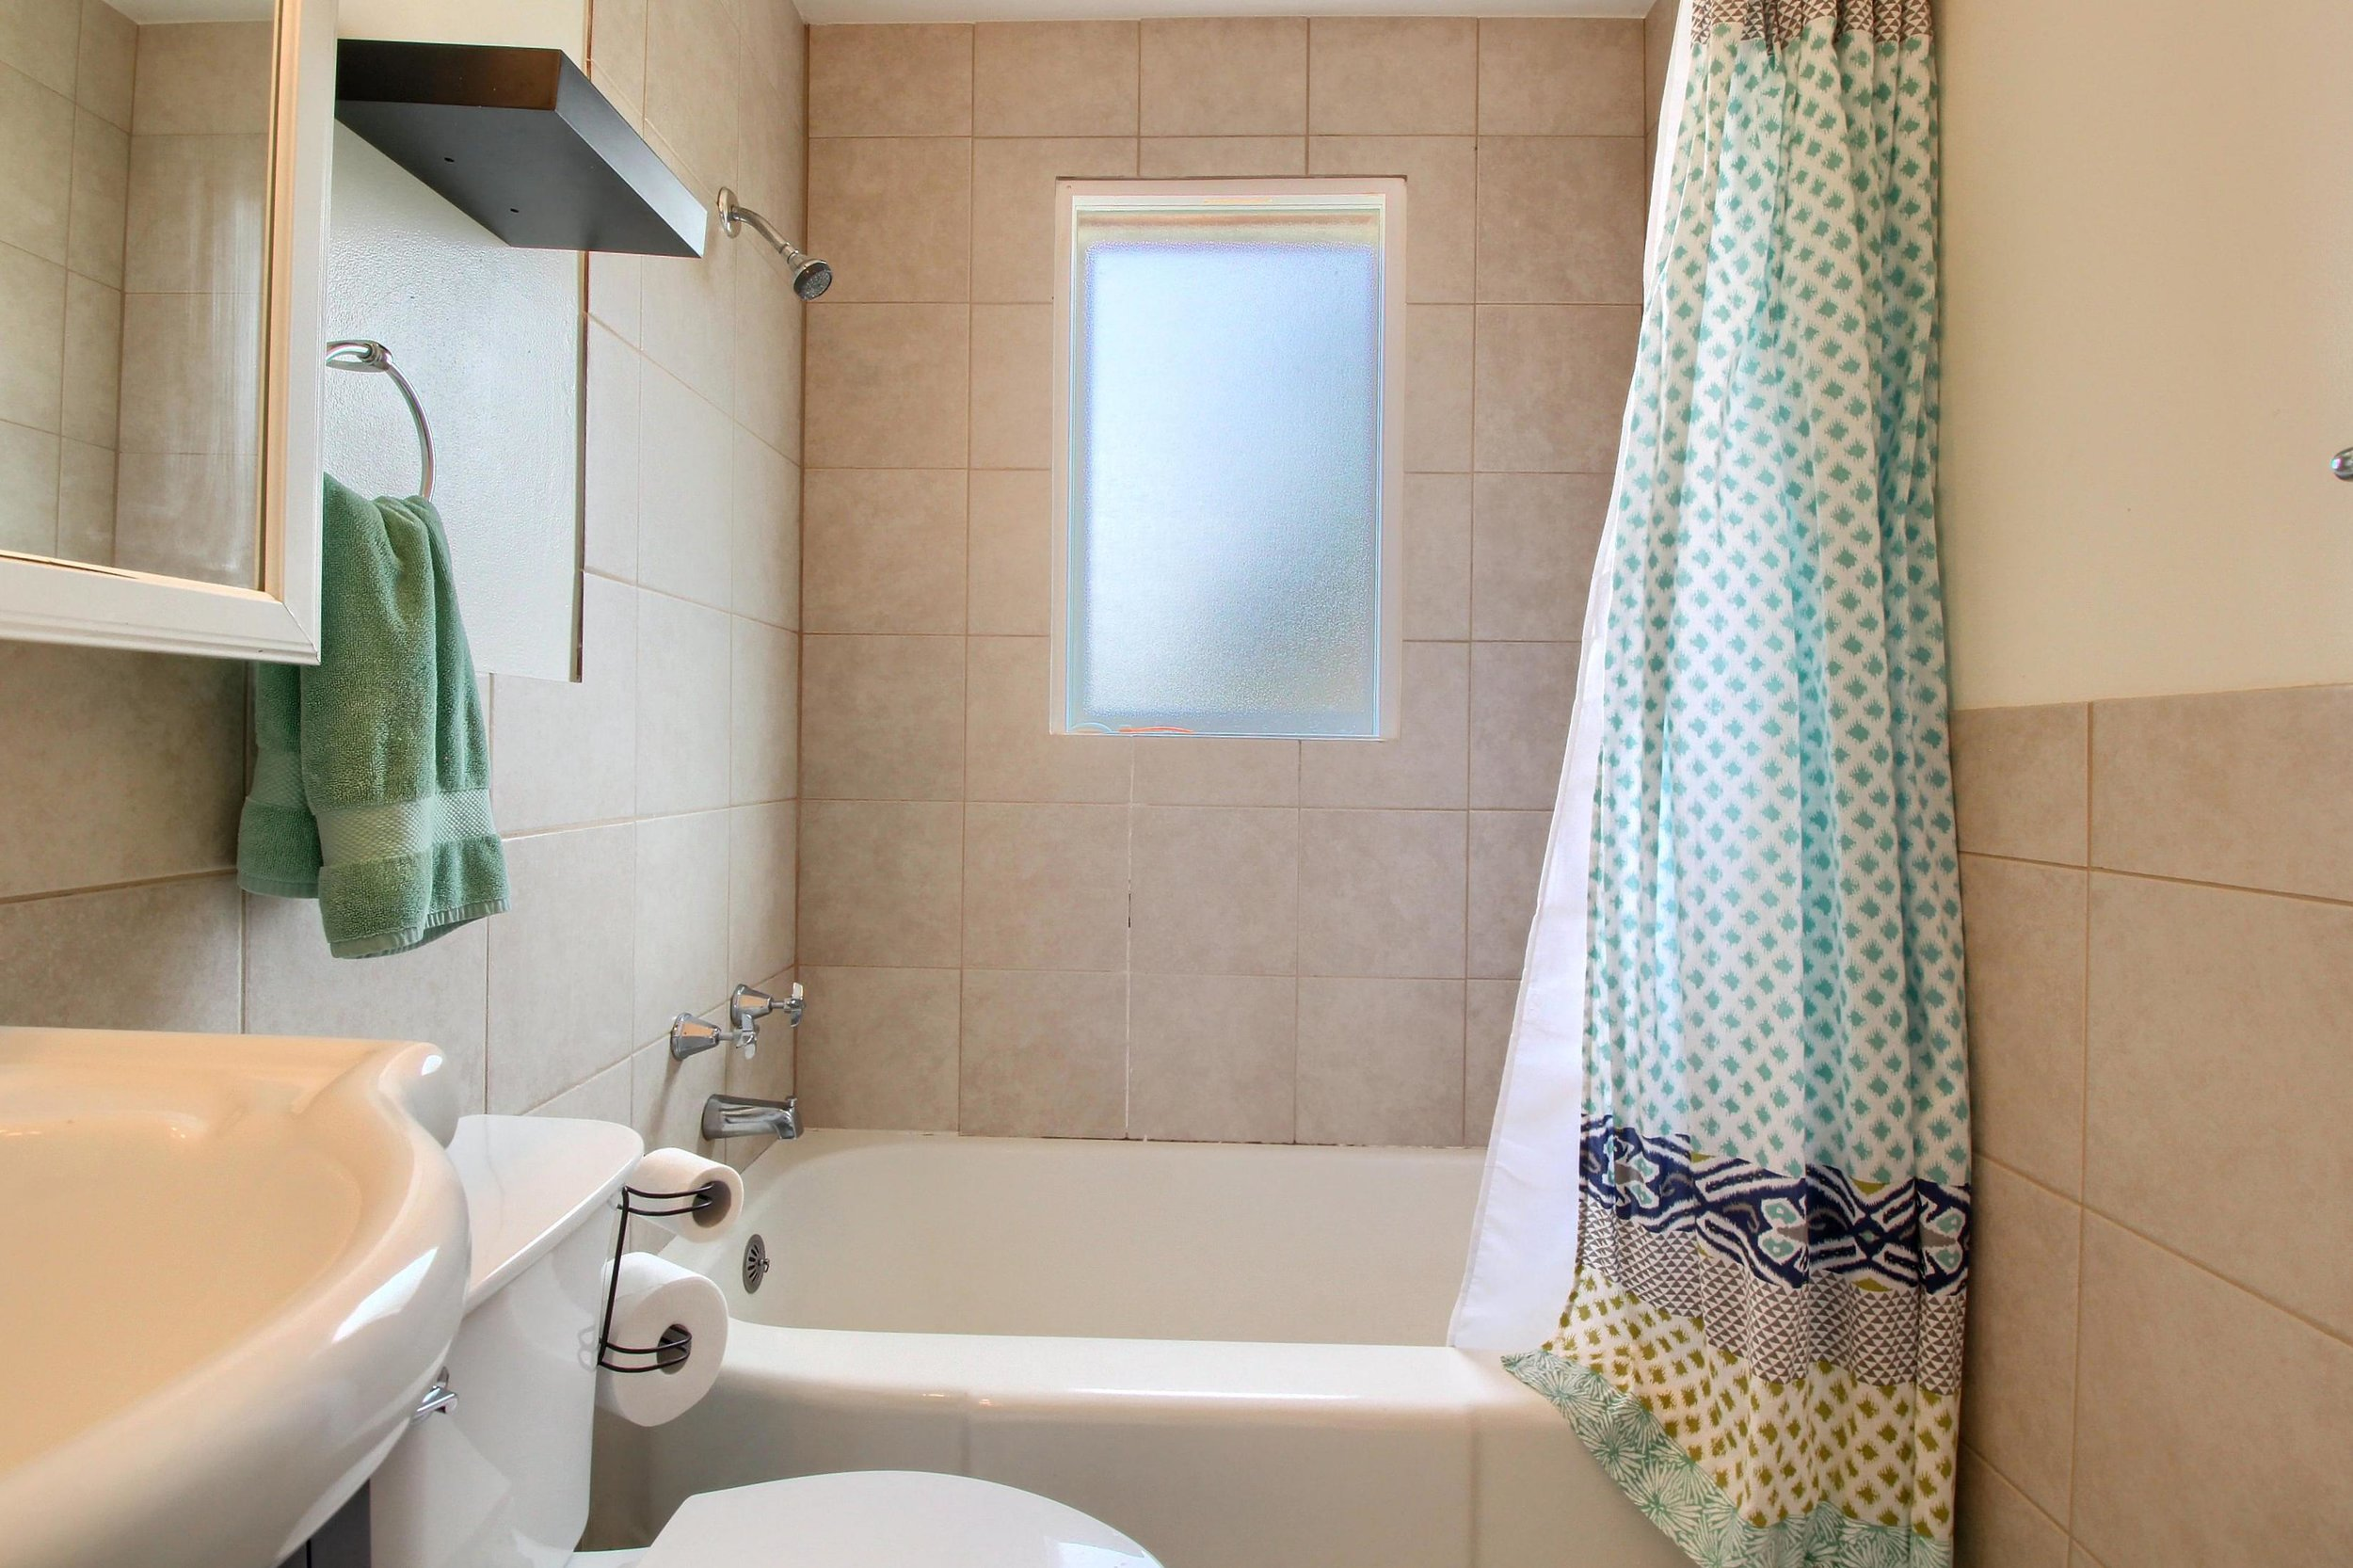 05_Master_Bathroom_IMG_1236.JPG